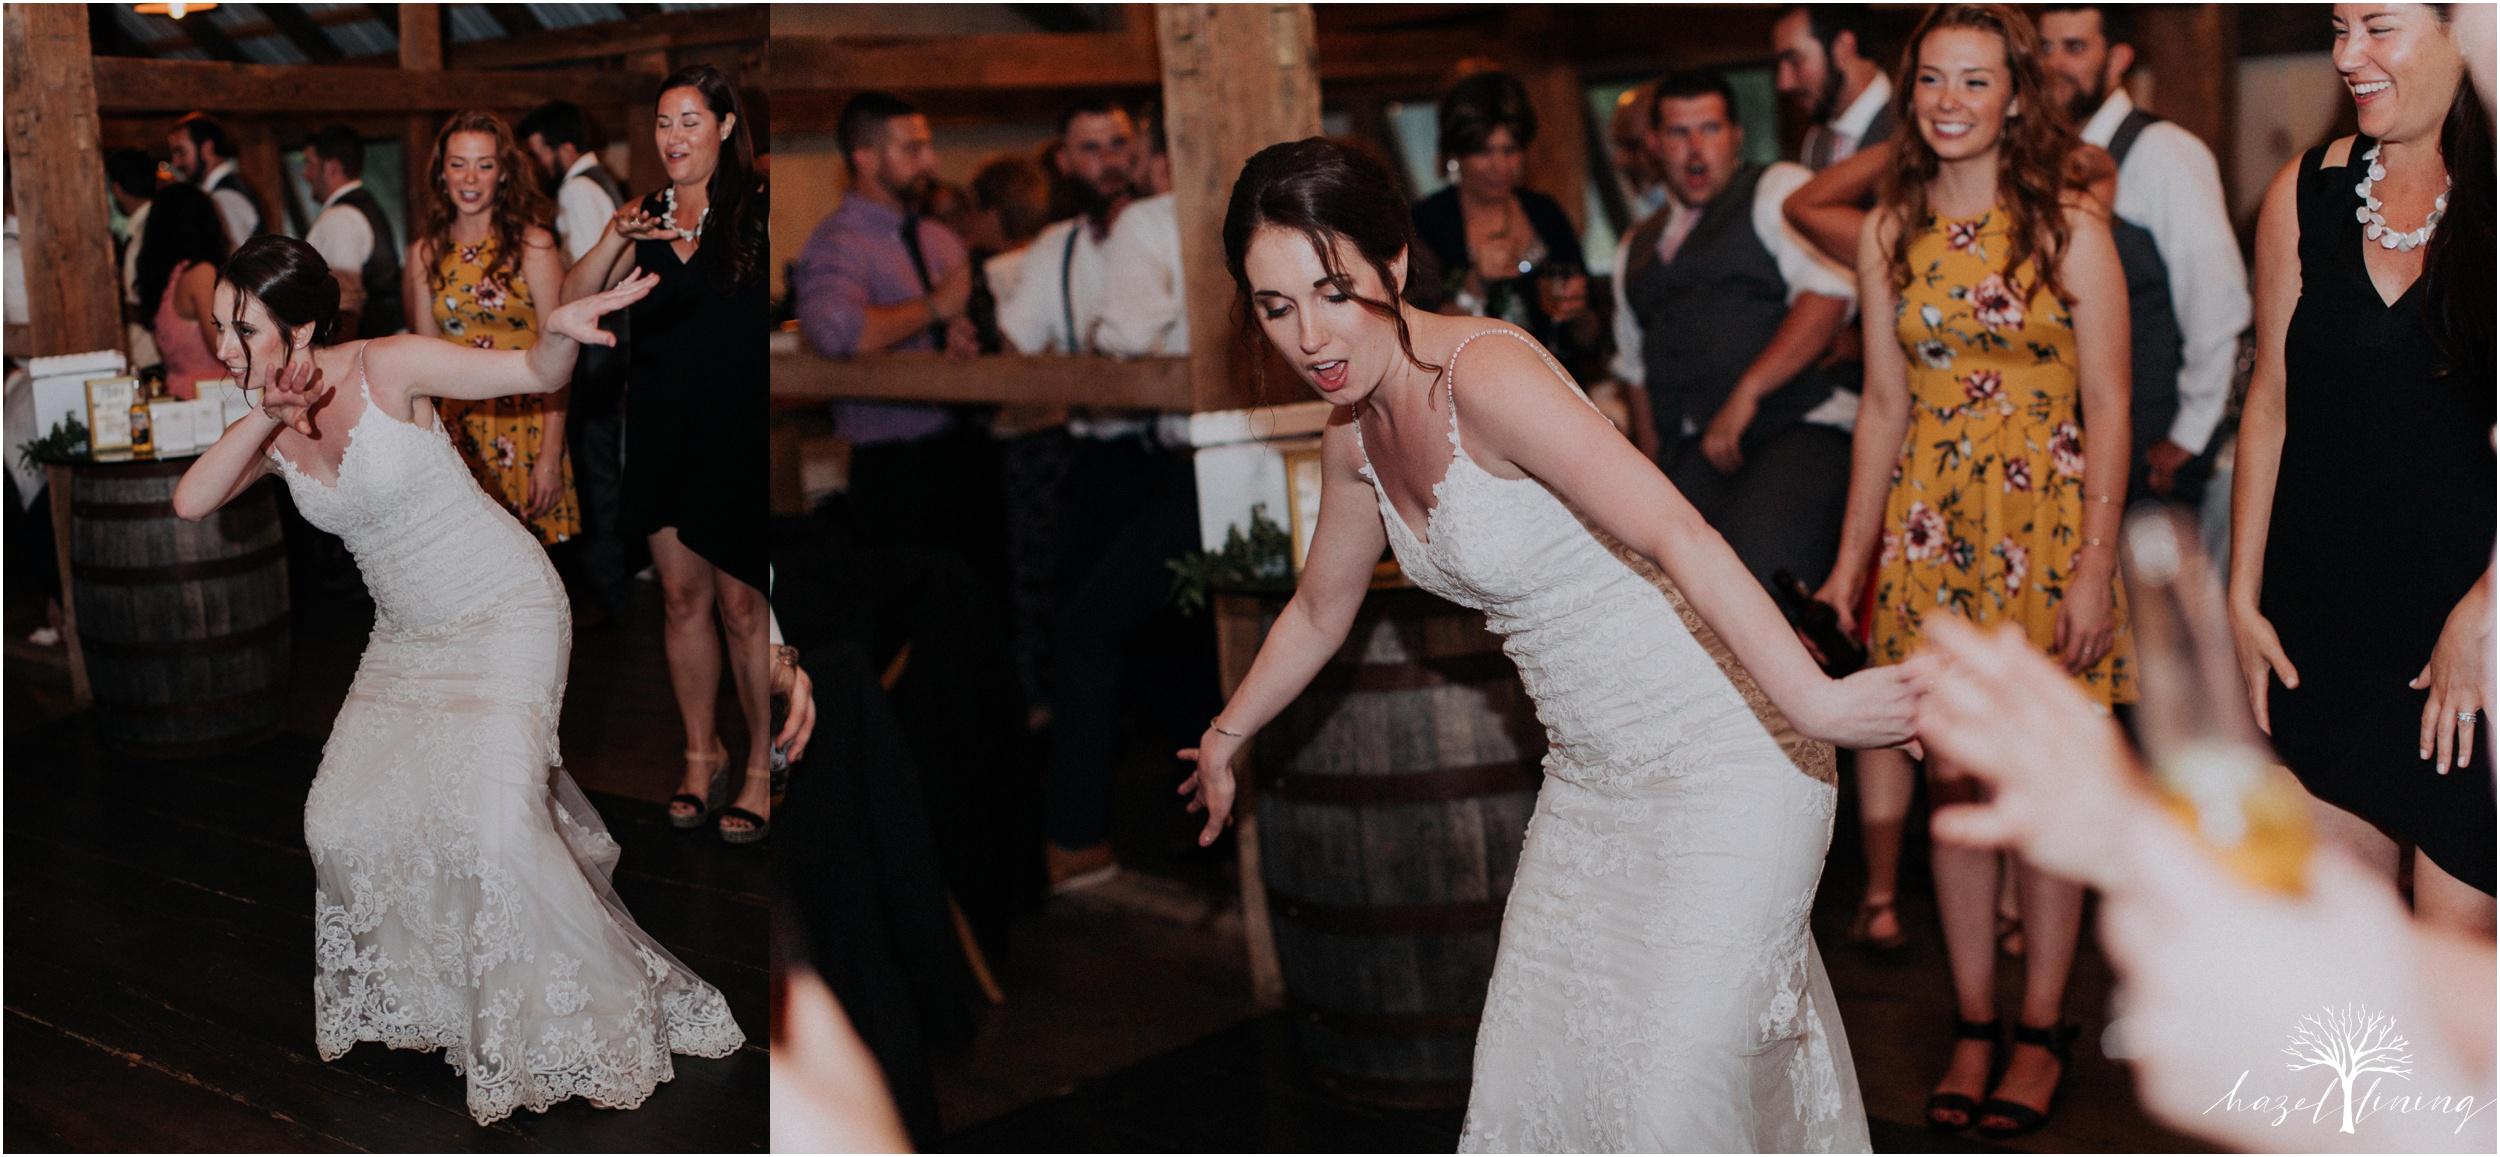 hazel-lining-travel-wedding-elopement-photography-lisa-landon-shoemaker-the-farm-bakery-and-events-bucks-county-quakertown-pennsylvania-summer-country-outdoor-farm-wedding_0157.jpg